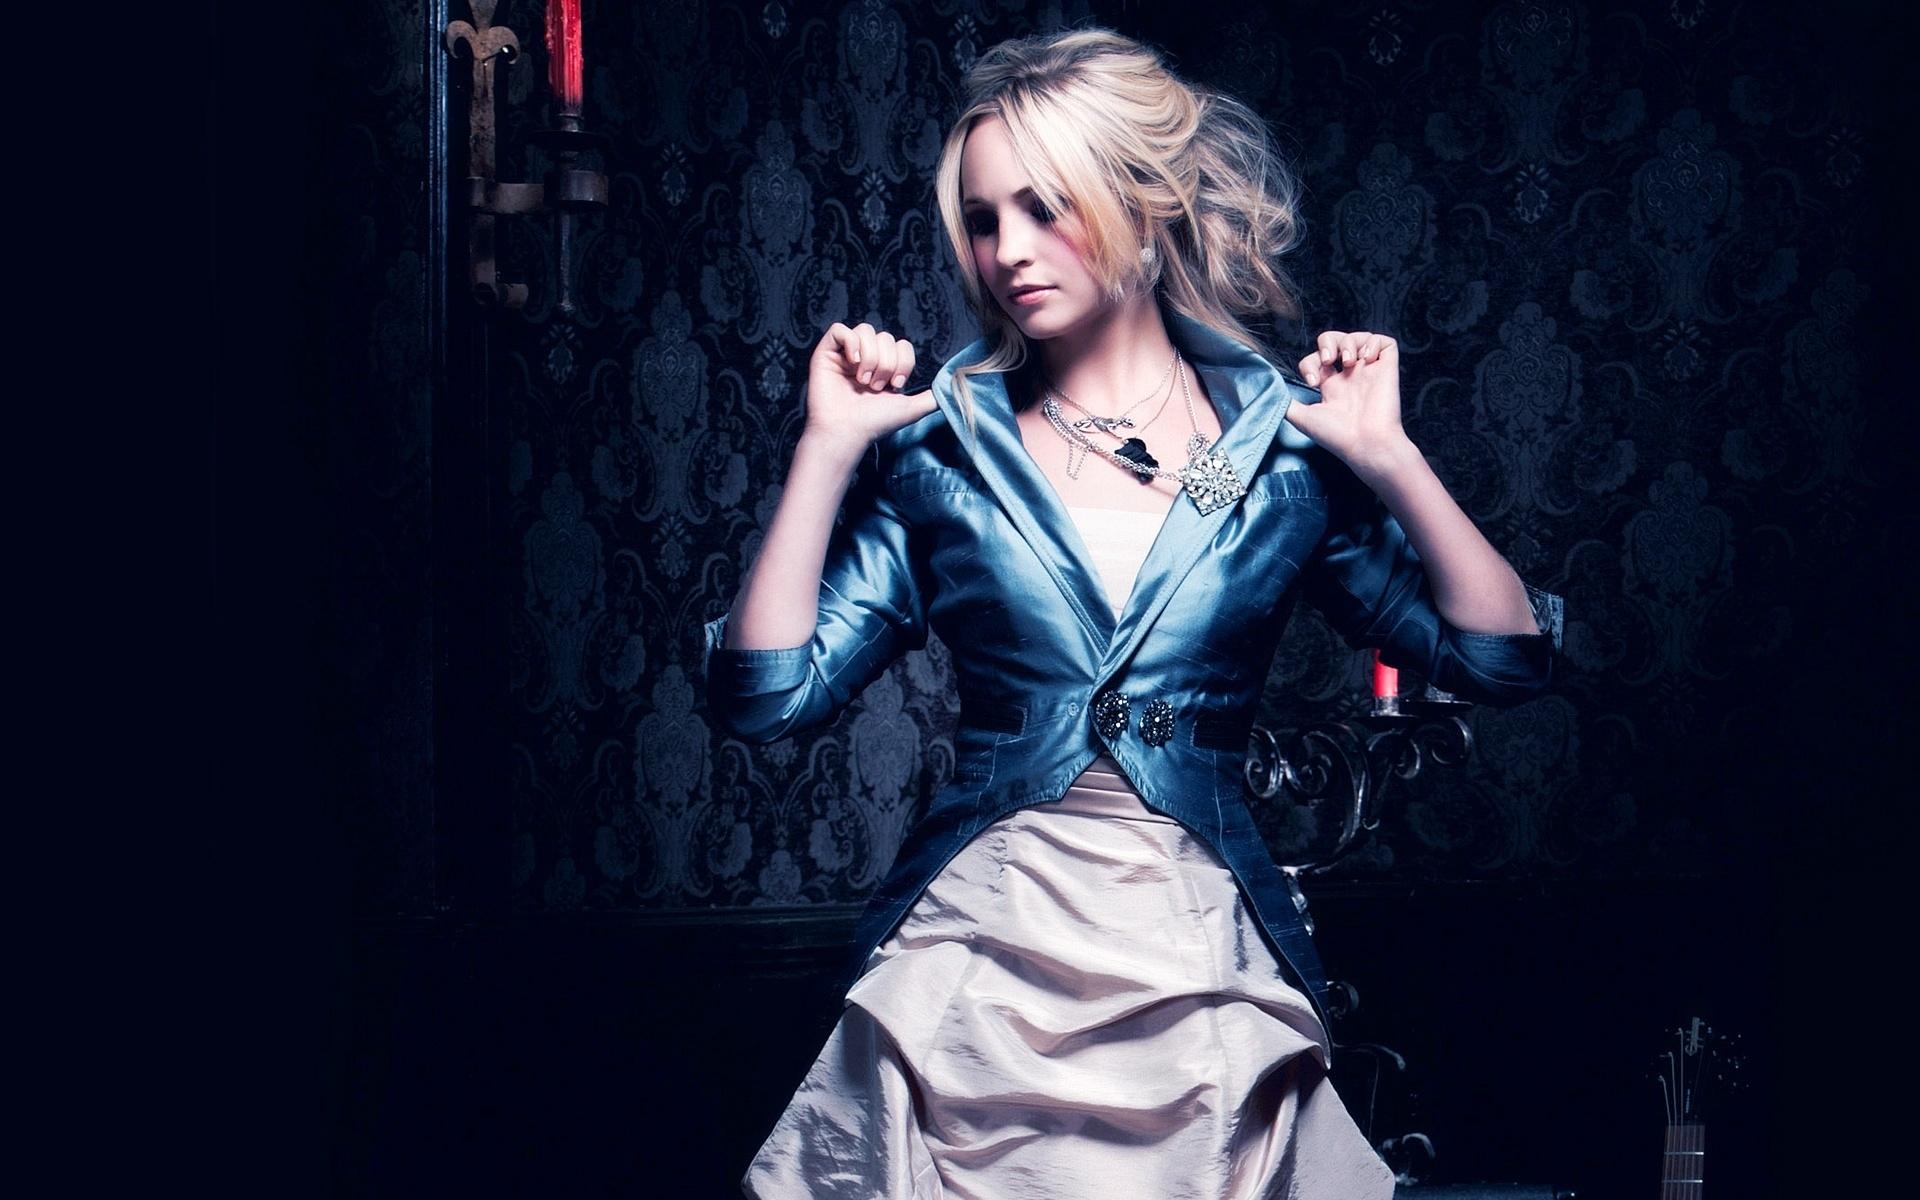 Amazing Dress Wallpaper 35583